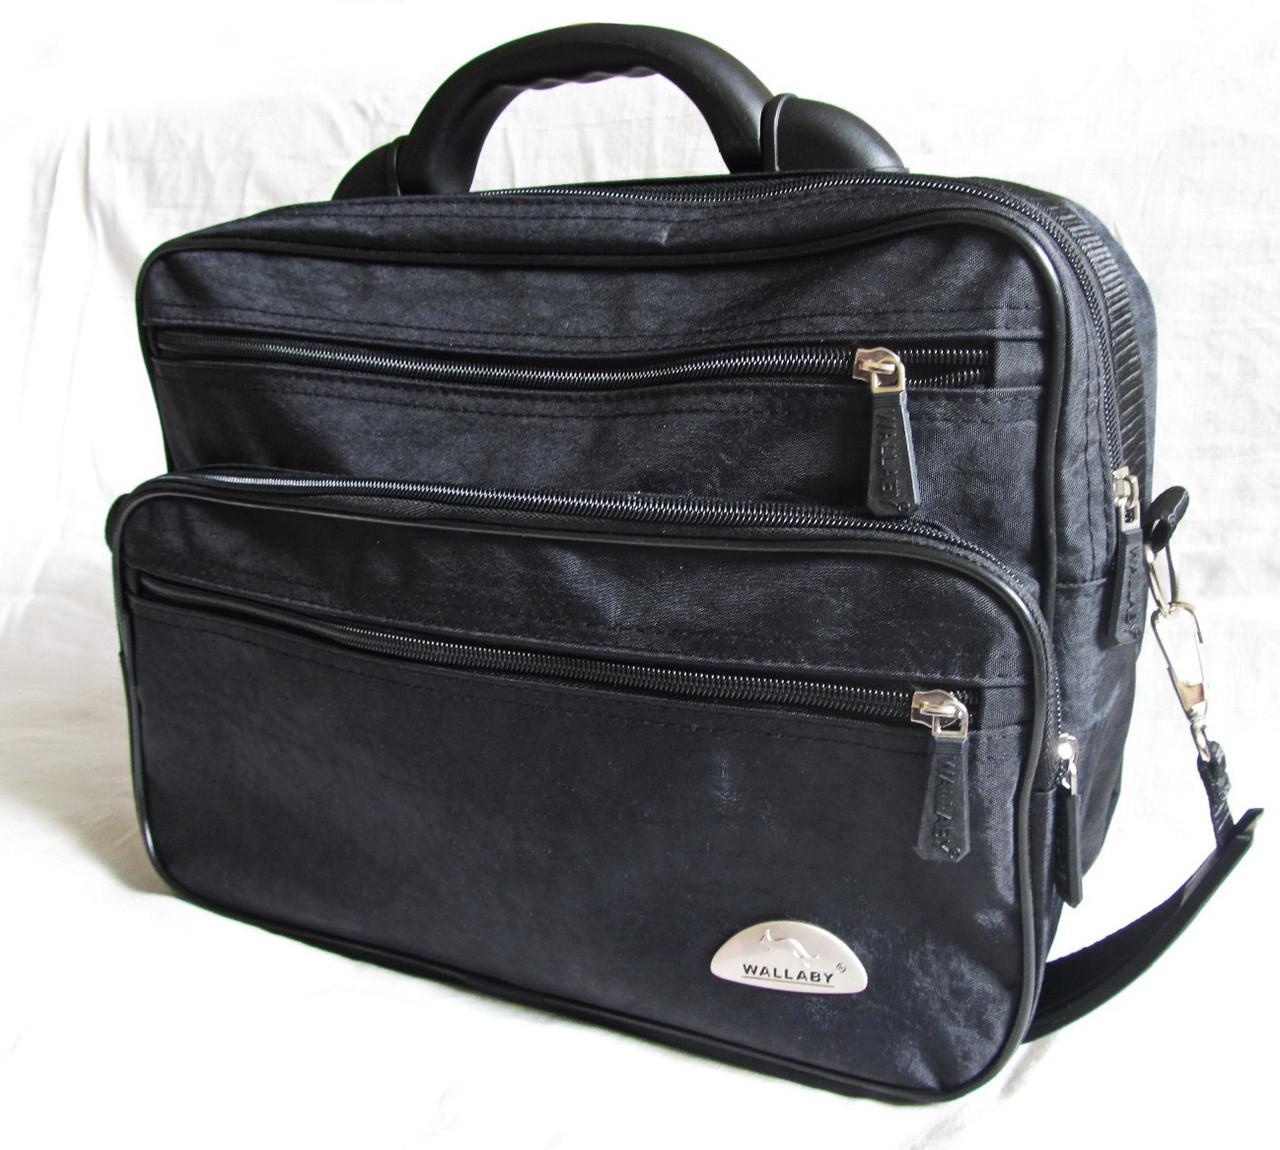 b81821f27ef9 Мужская сумка Wallaby 26531 черная полукаркасная барсетка через ...